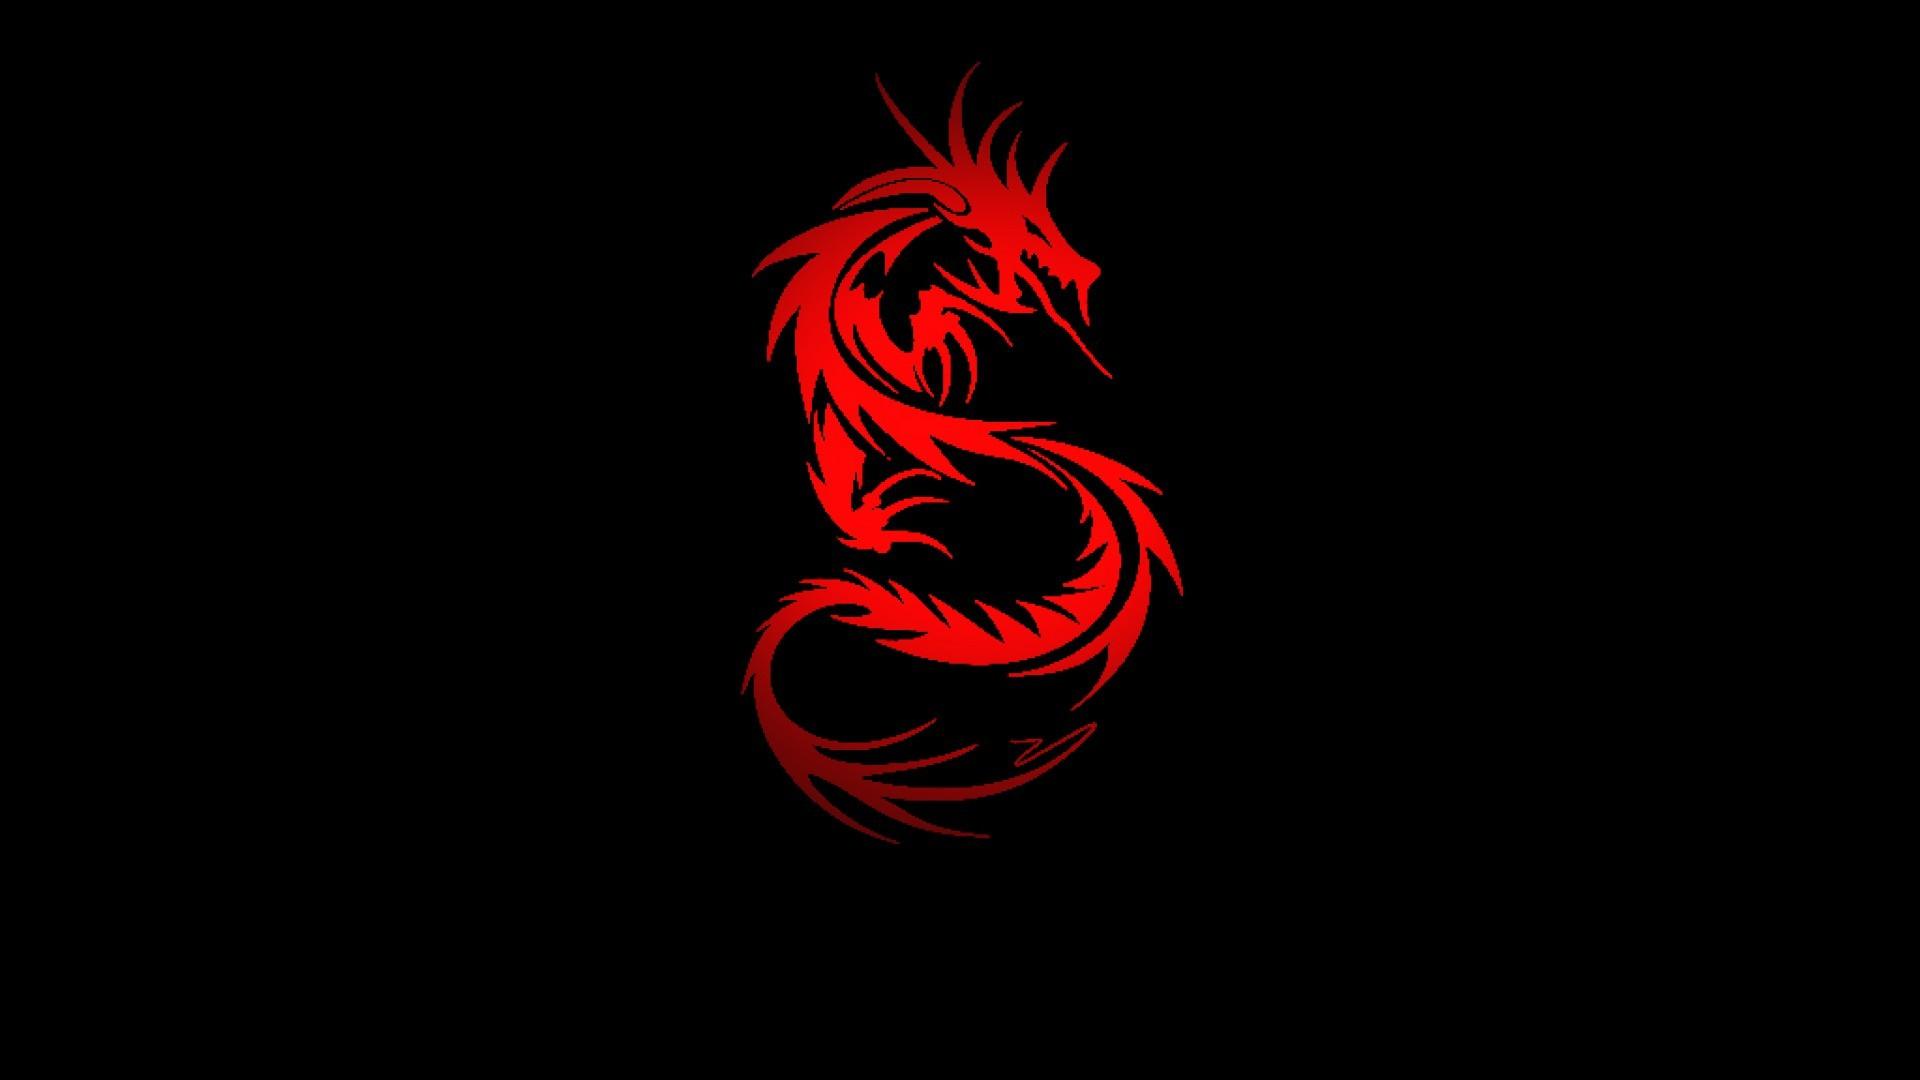 Red dragon Wallpaper #51245 | Wallpaper Hd | Pinterest | Red dragon,  Wallpaper and Dragons